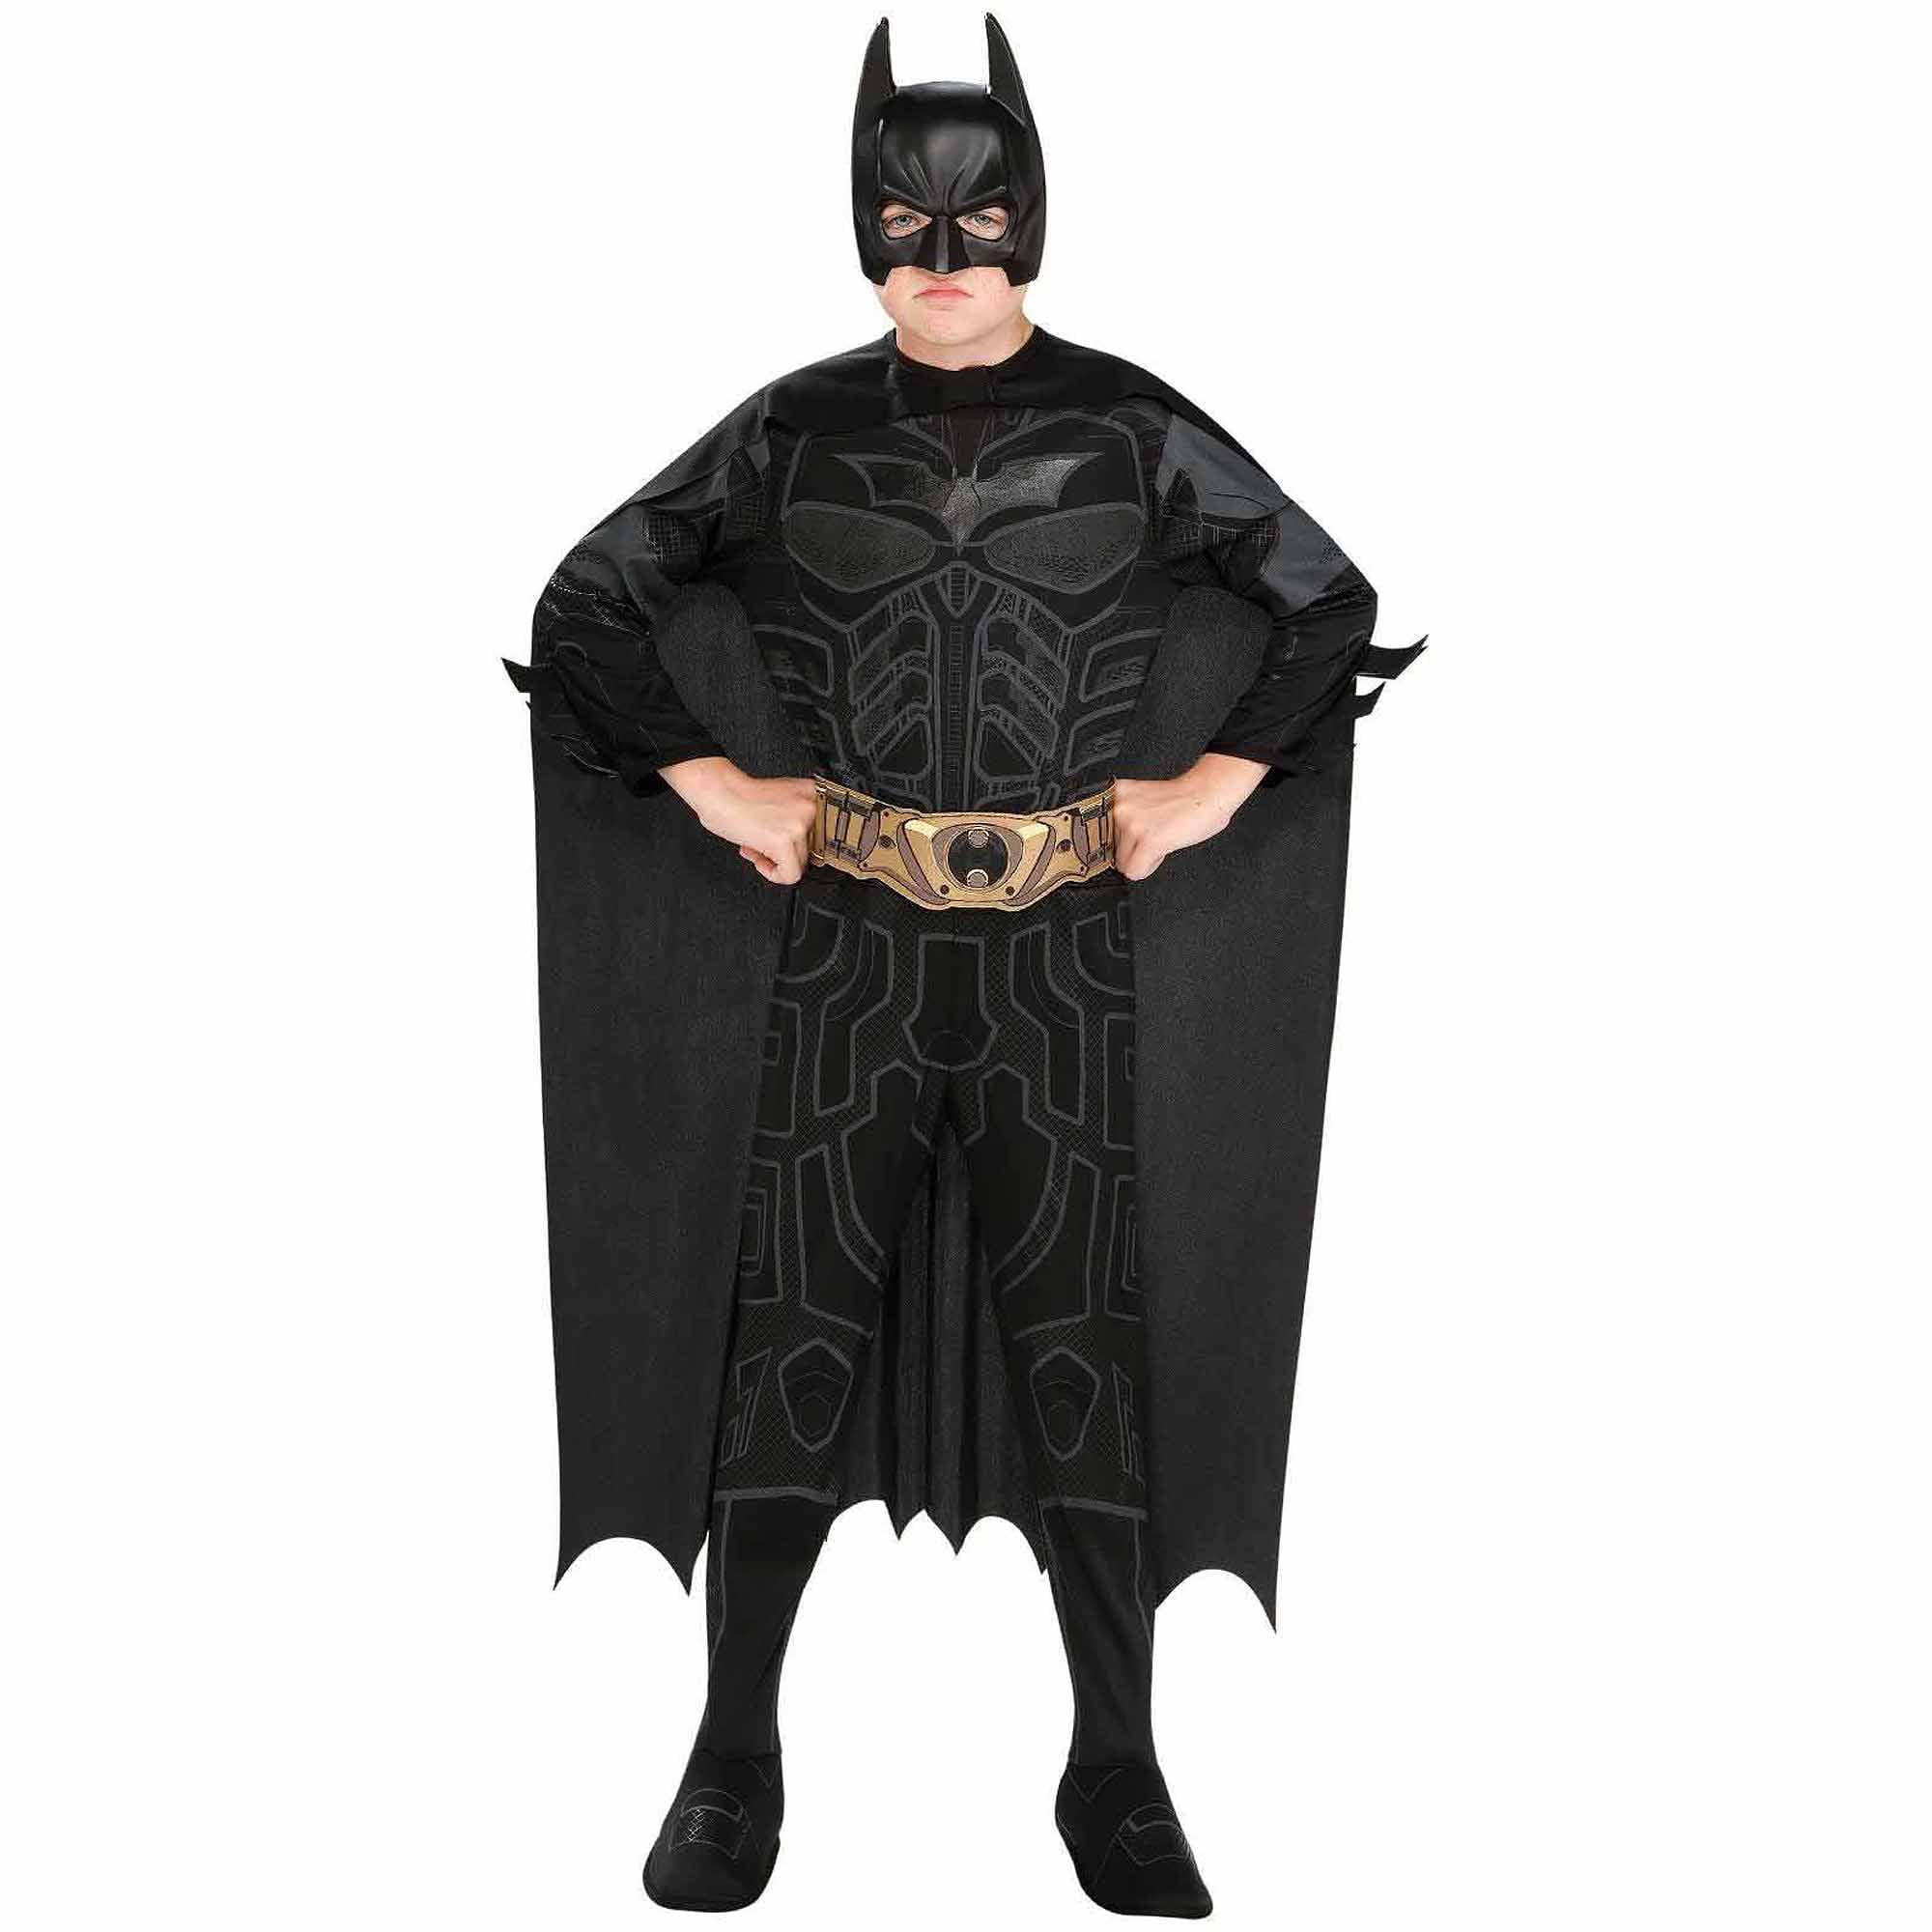 Batman The Dark Knight Rises Child Halloween Costume